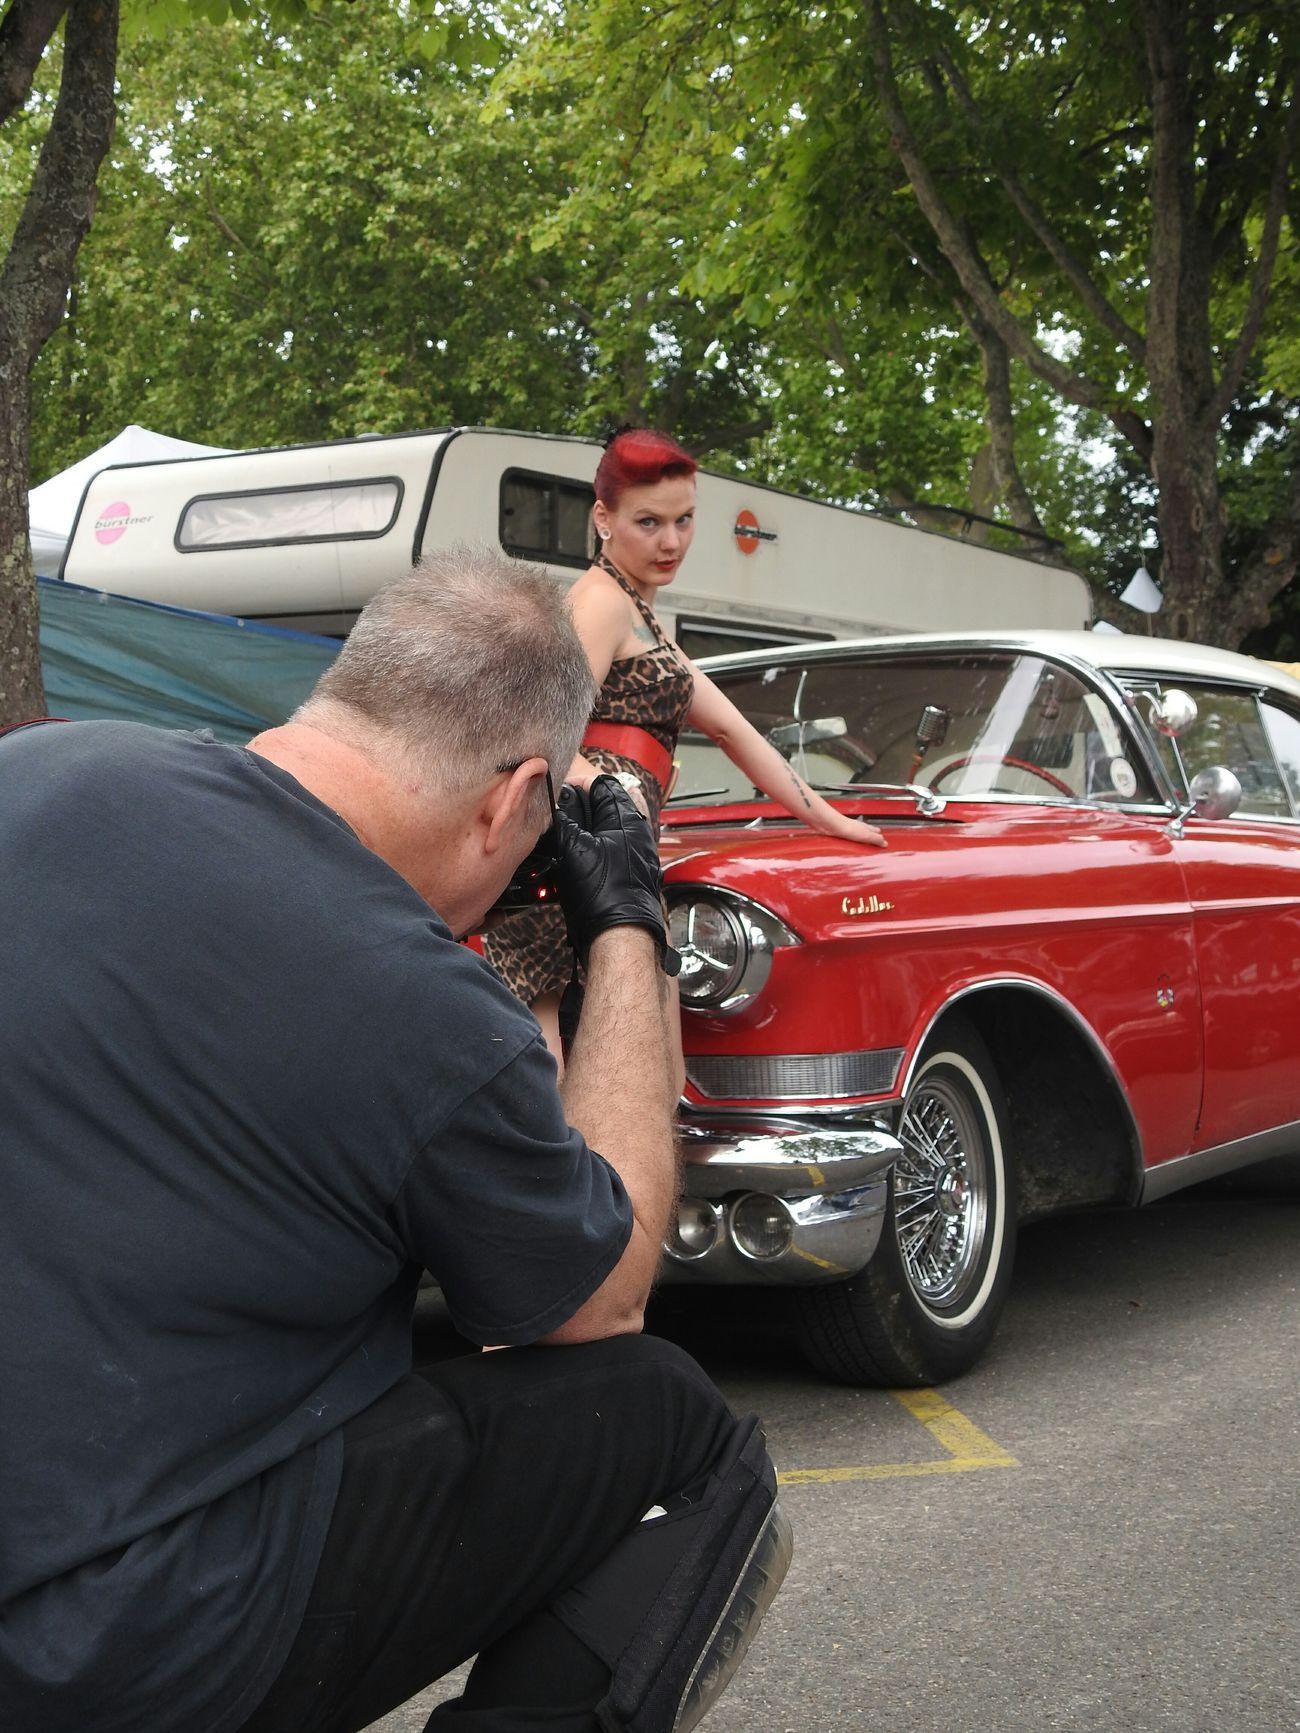 Le photographe et son modèle Models Photographing Photographers Pinup Fashion Tattoomodels